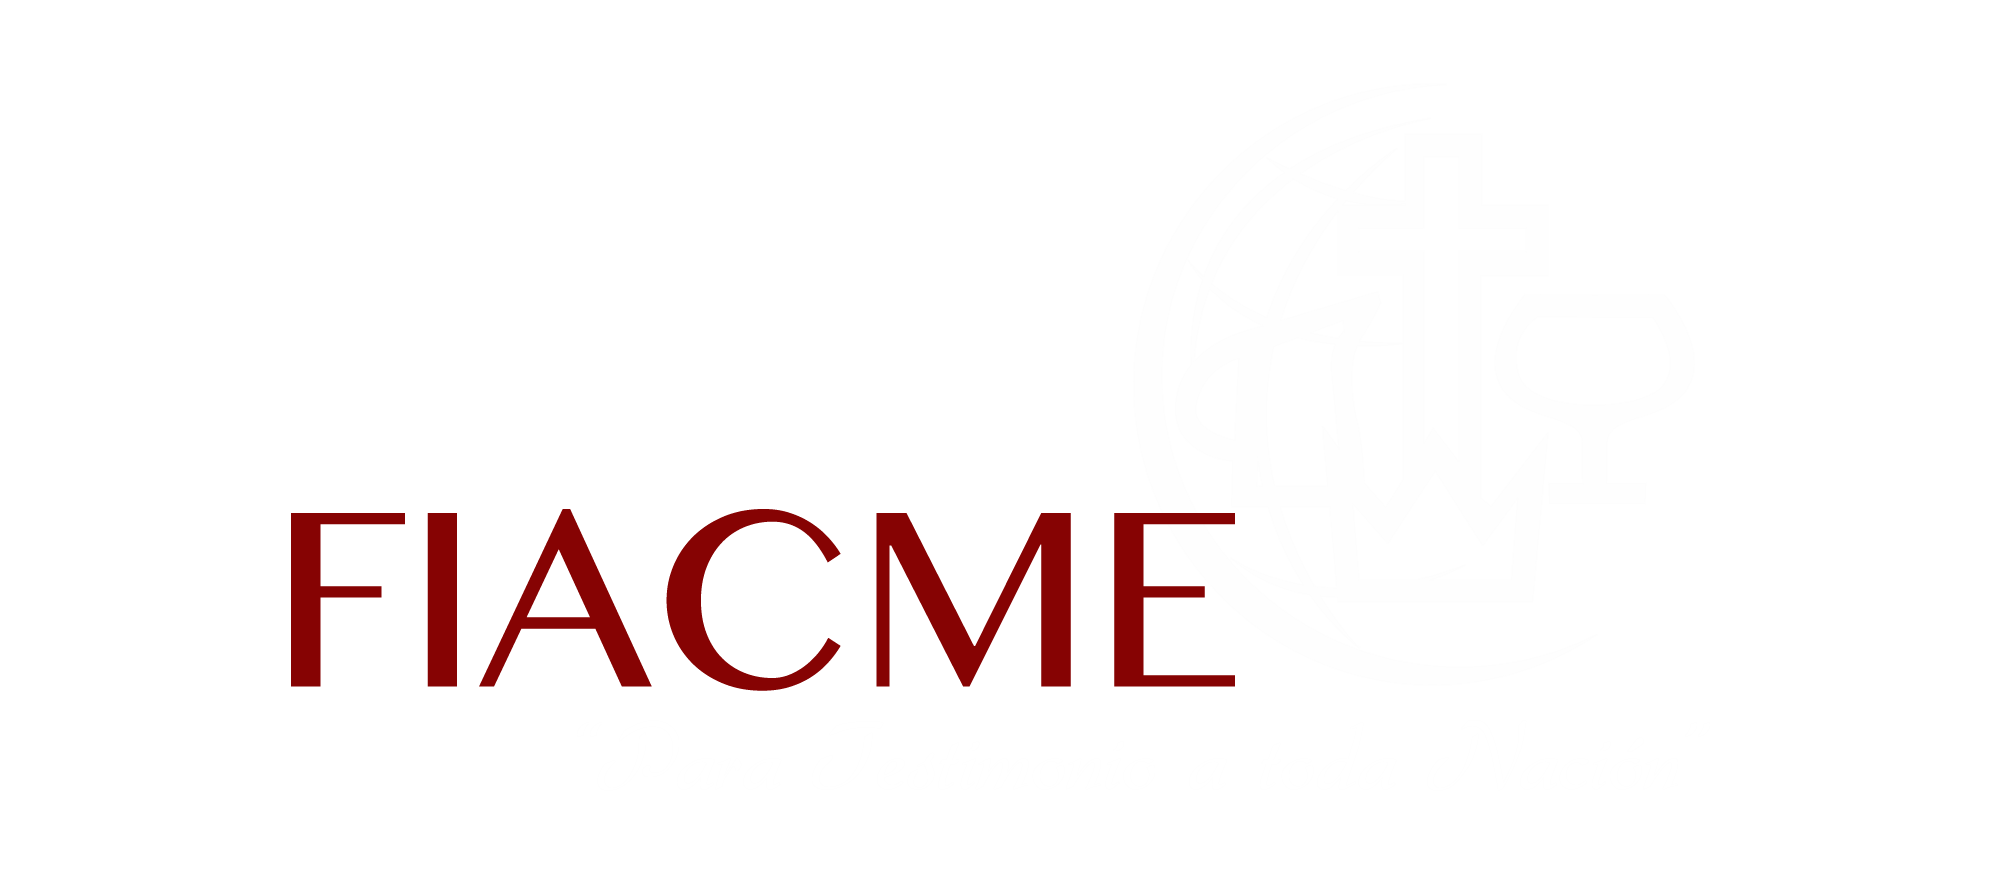 FIACME